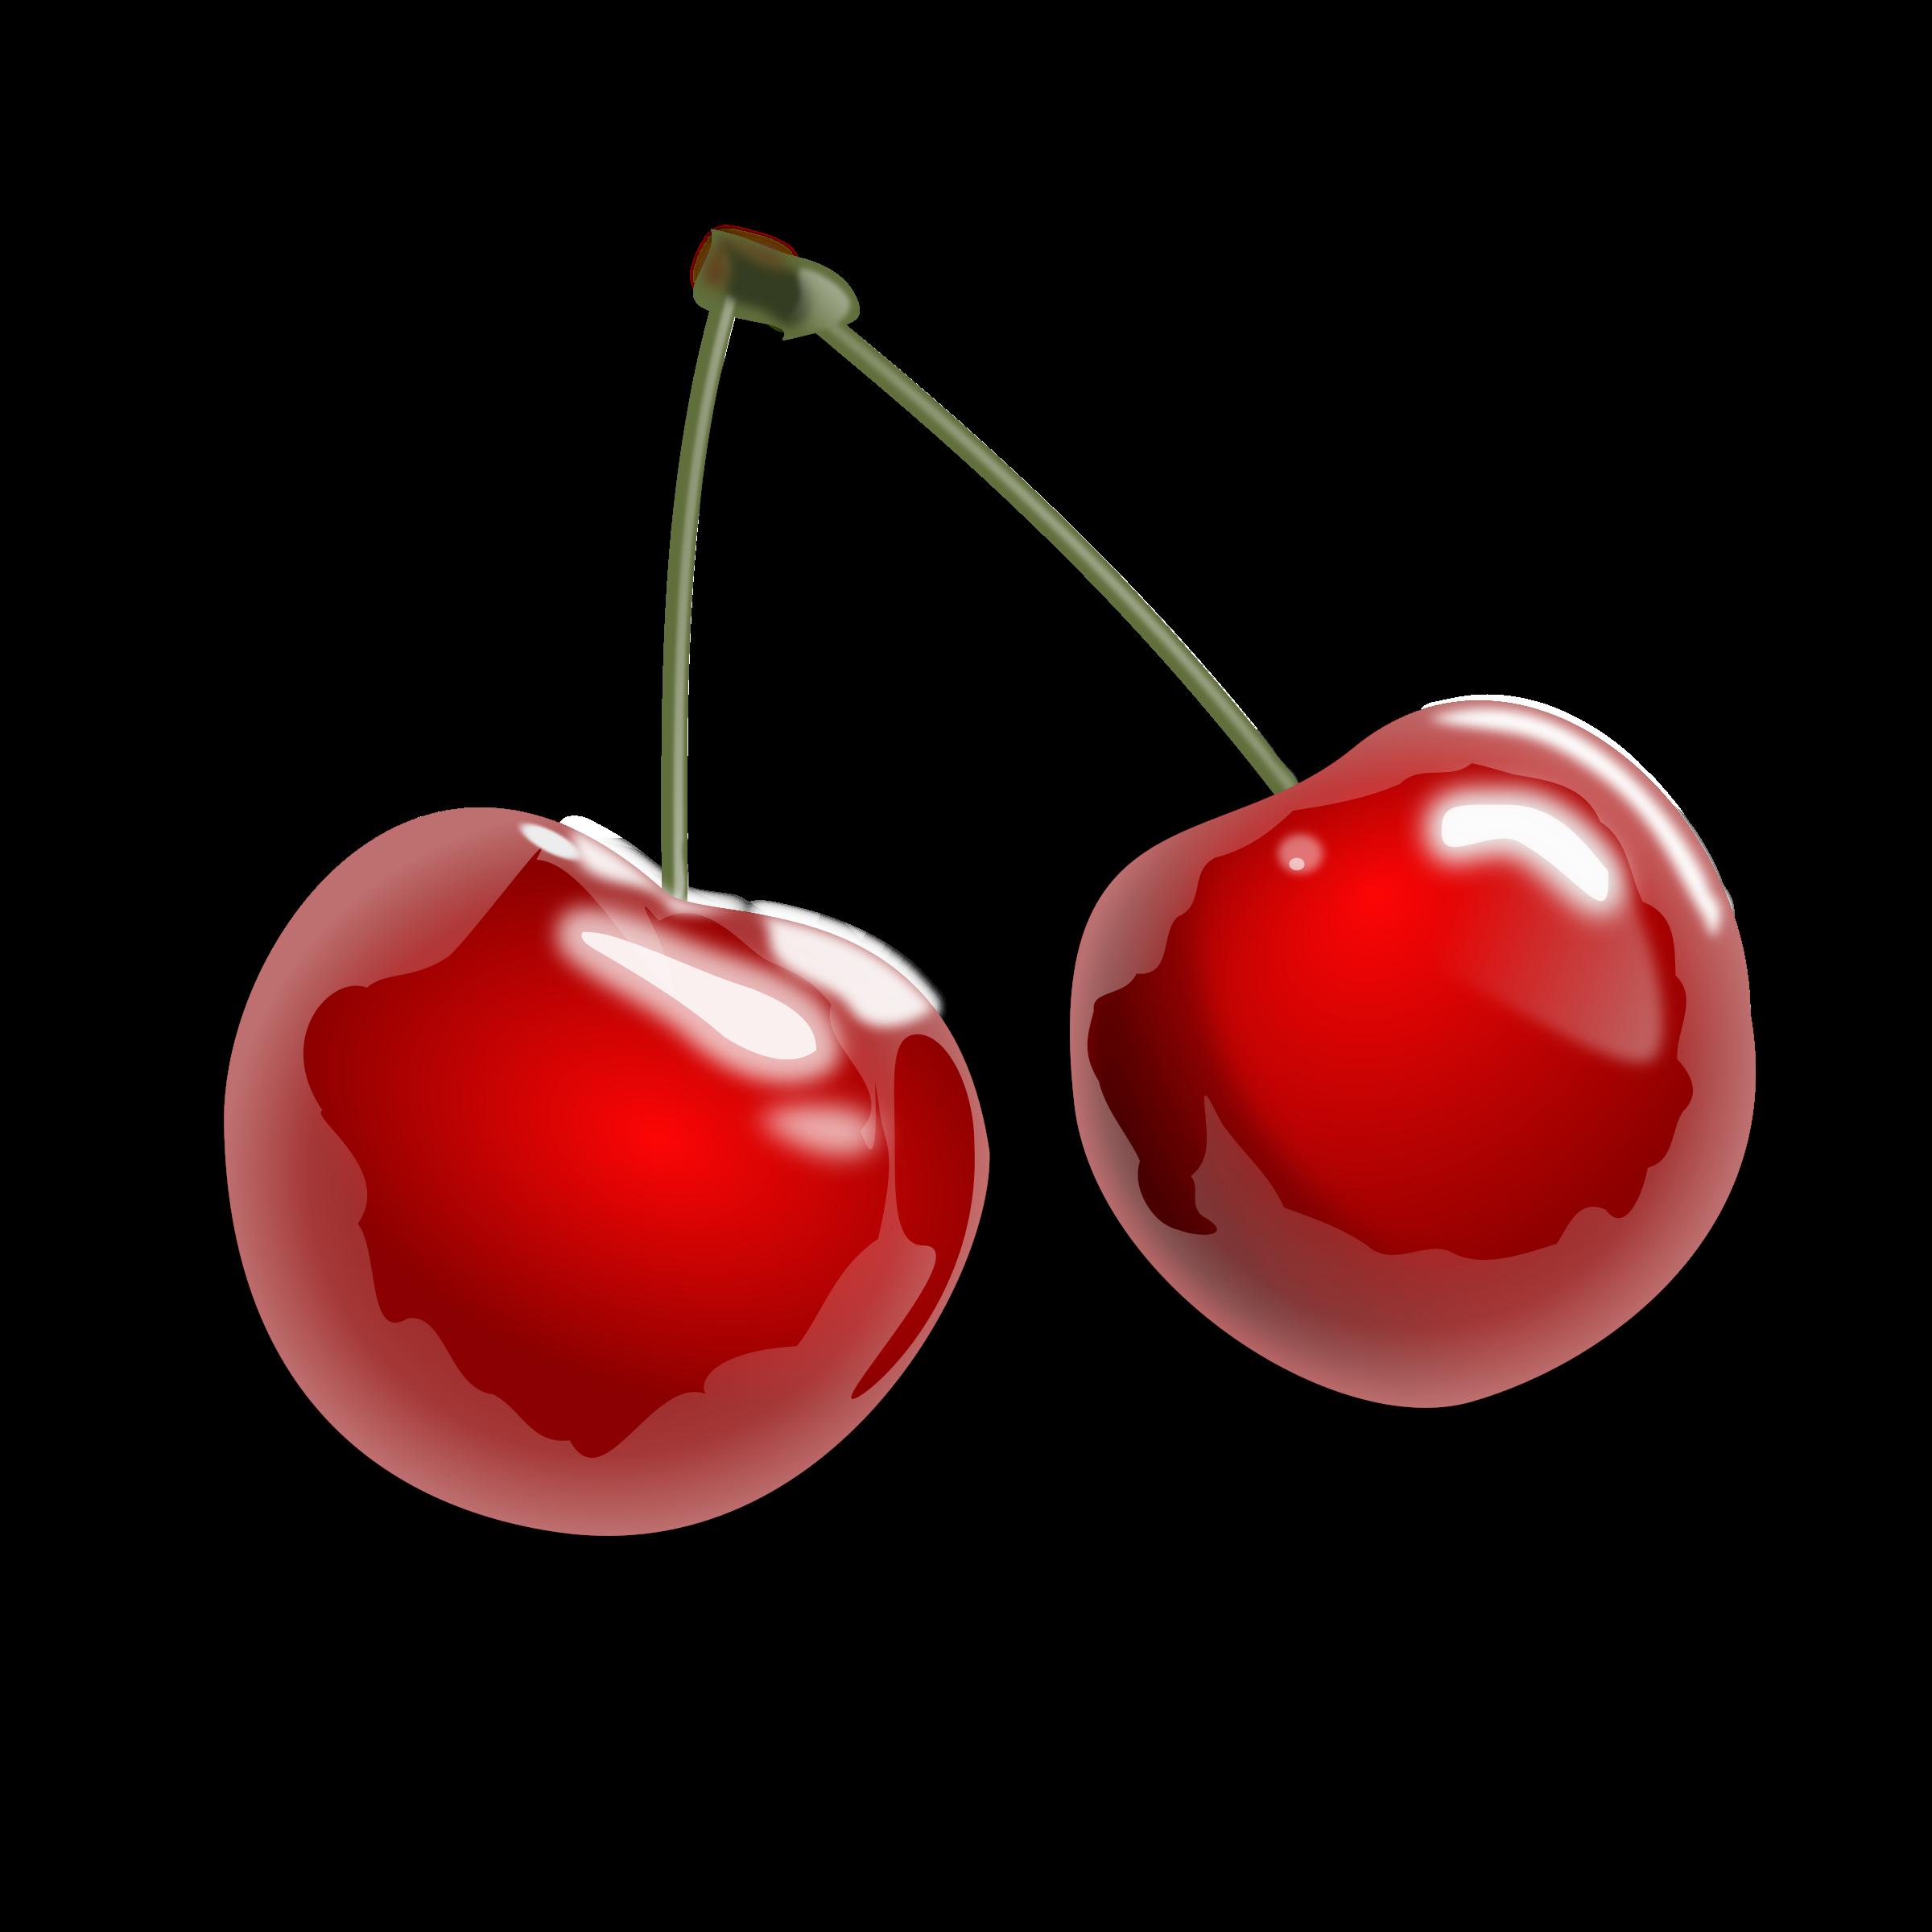 Cherries big image png. Heart clipart cherry